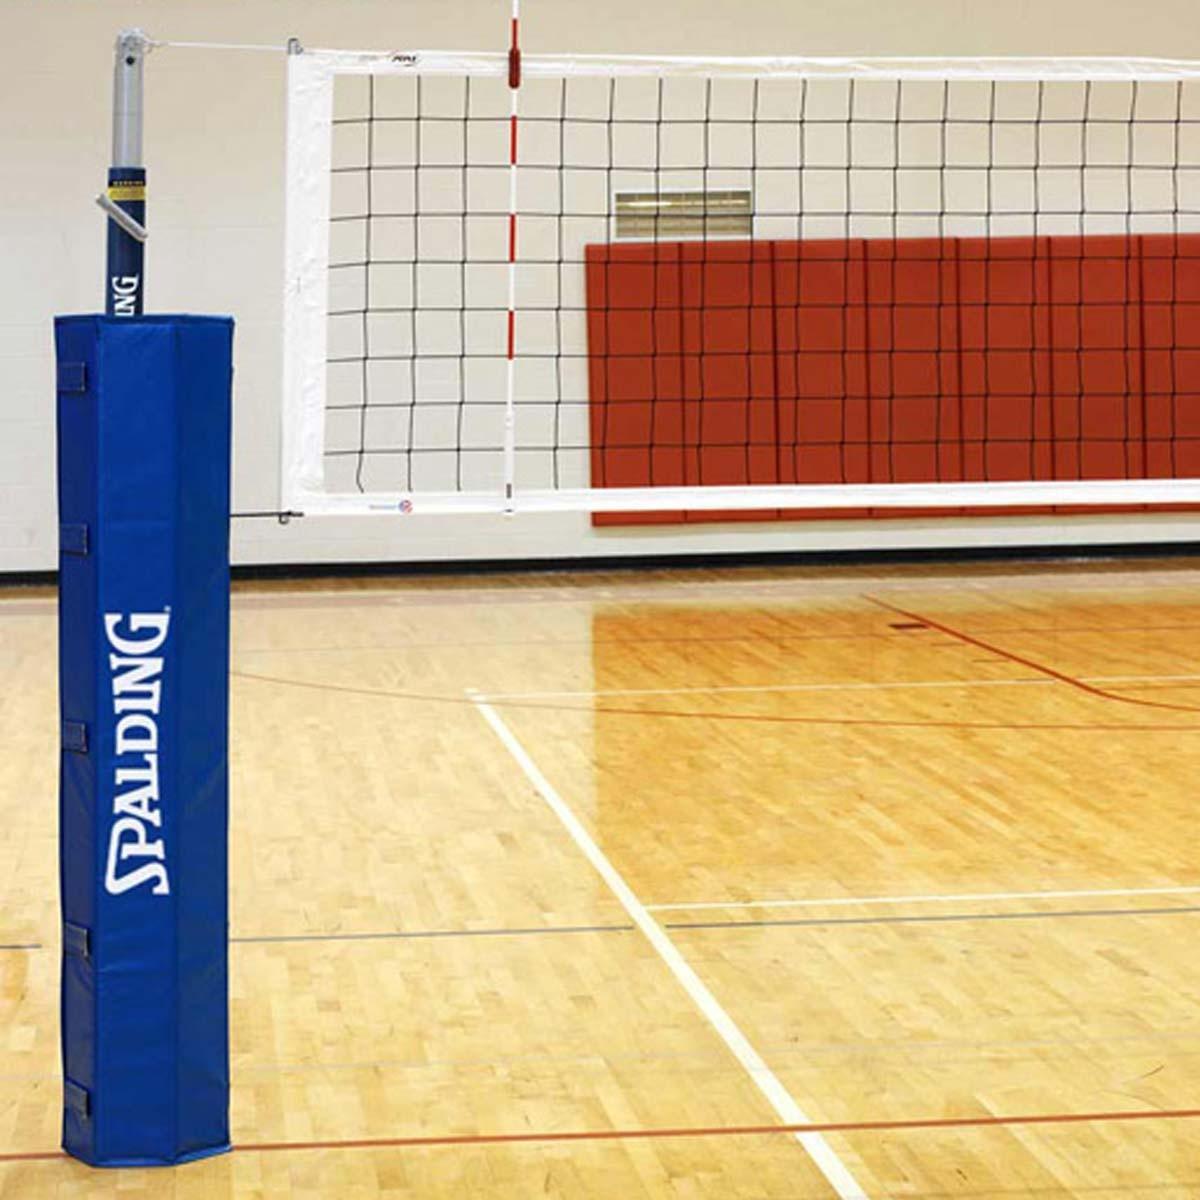 Spalding SEA110 Elite Aluminum Volleyball Net System